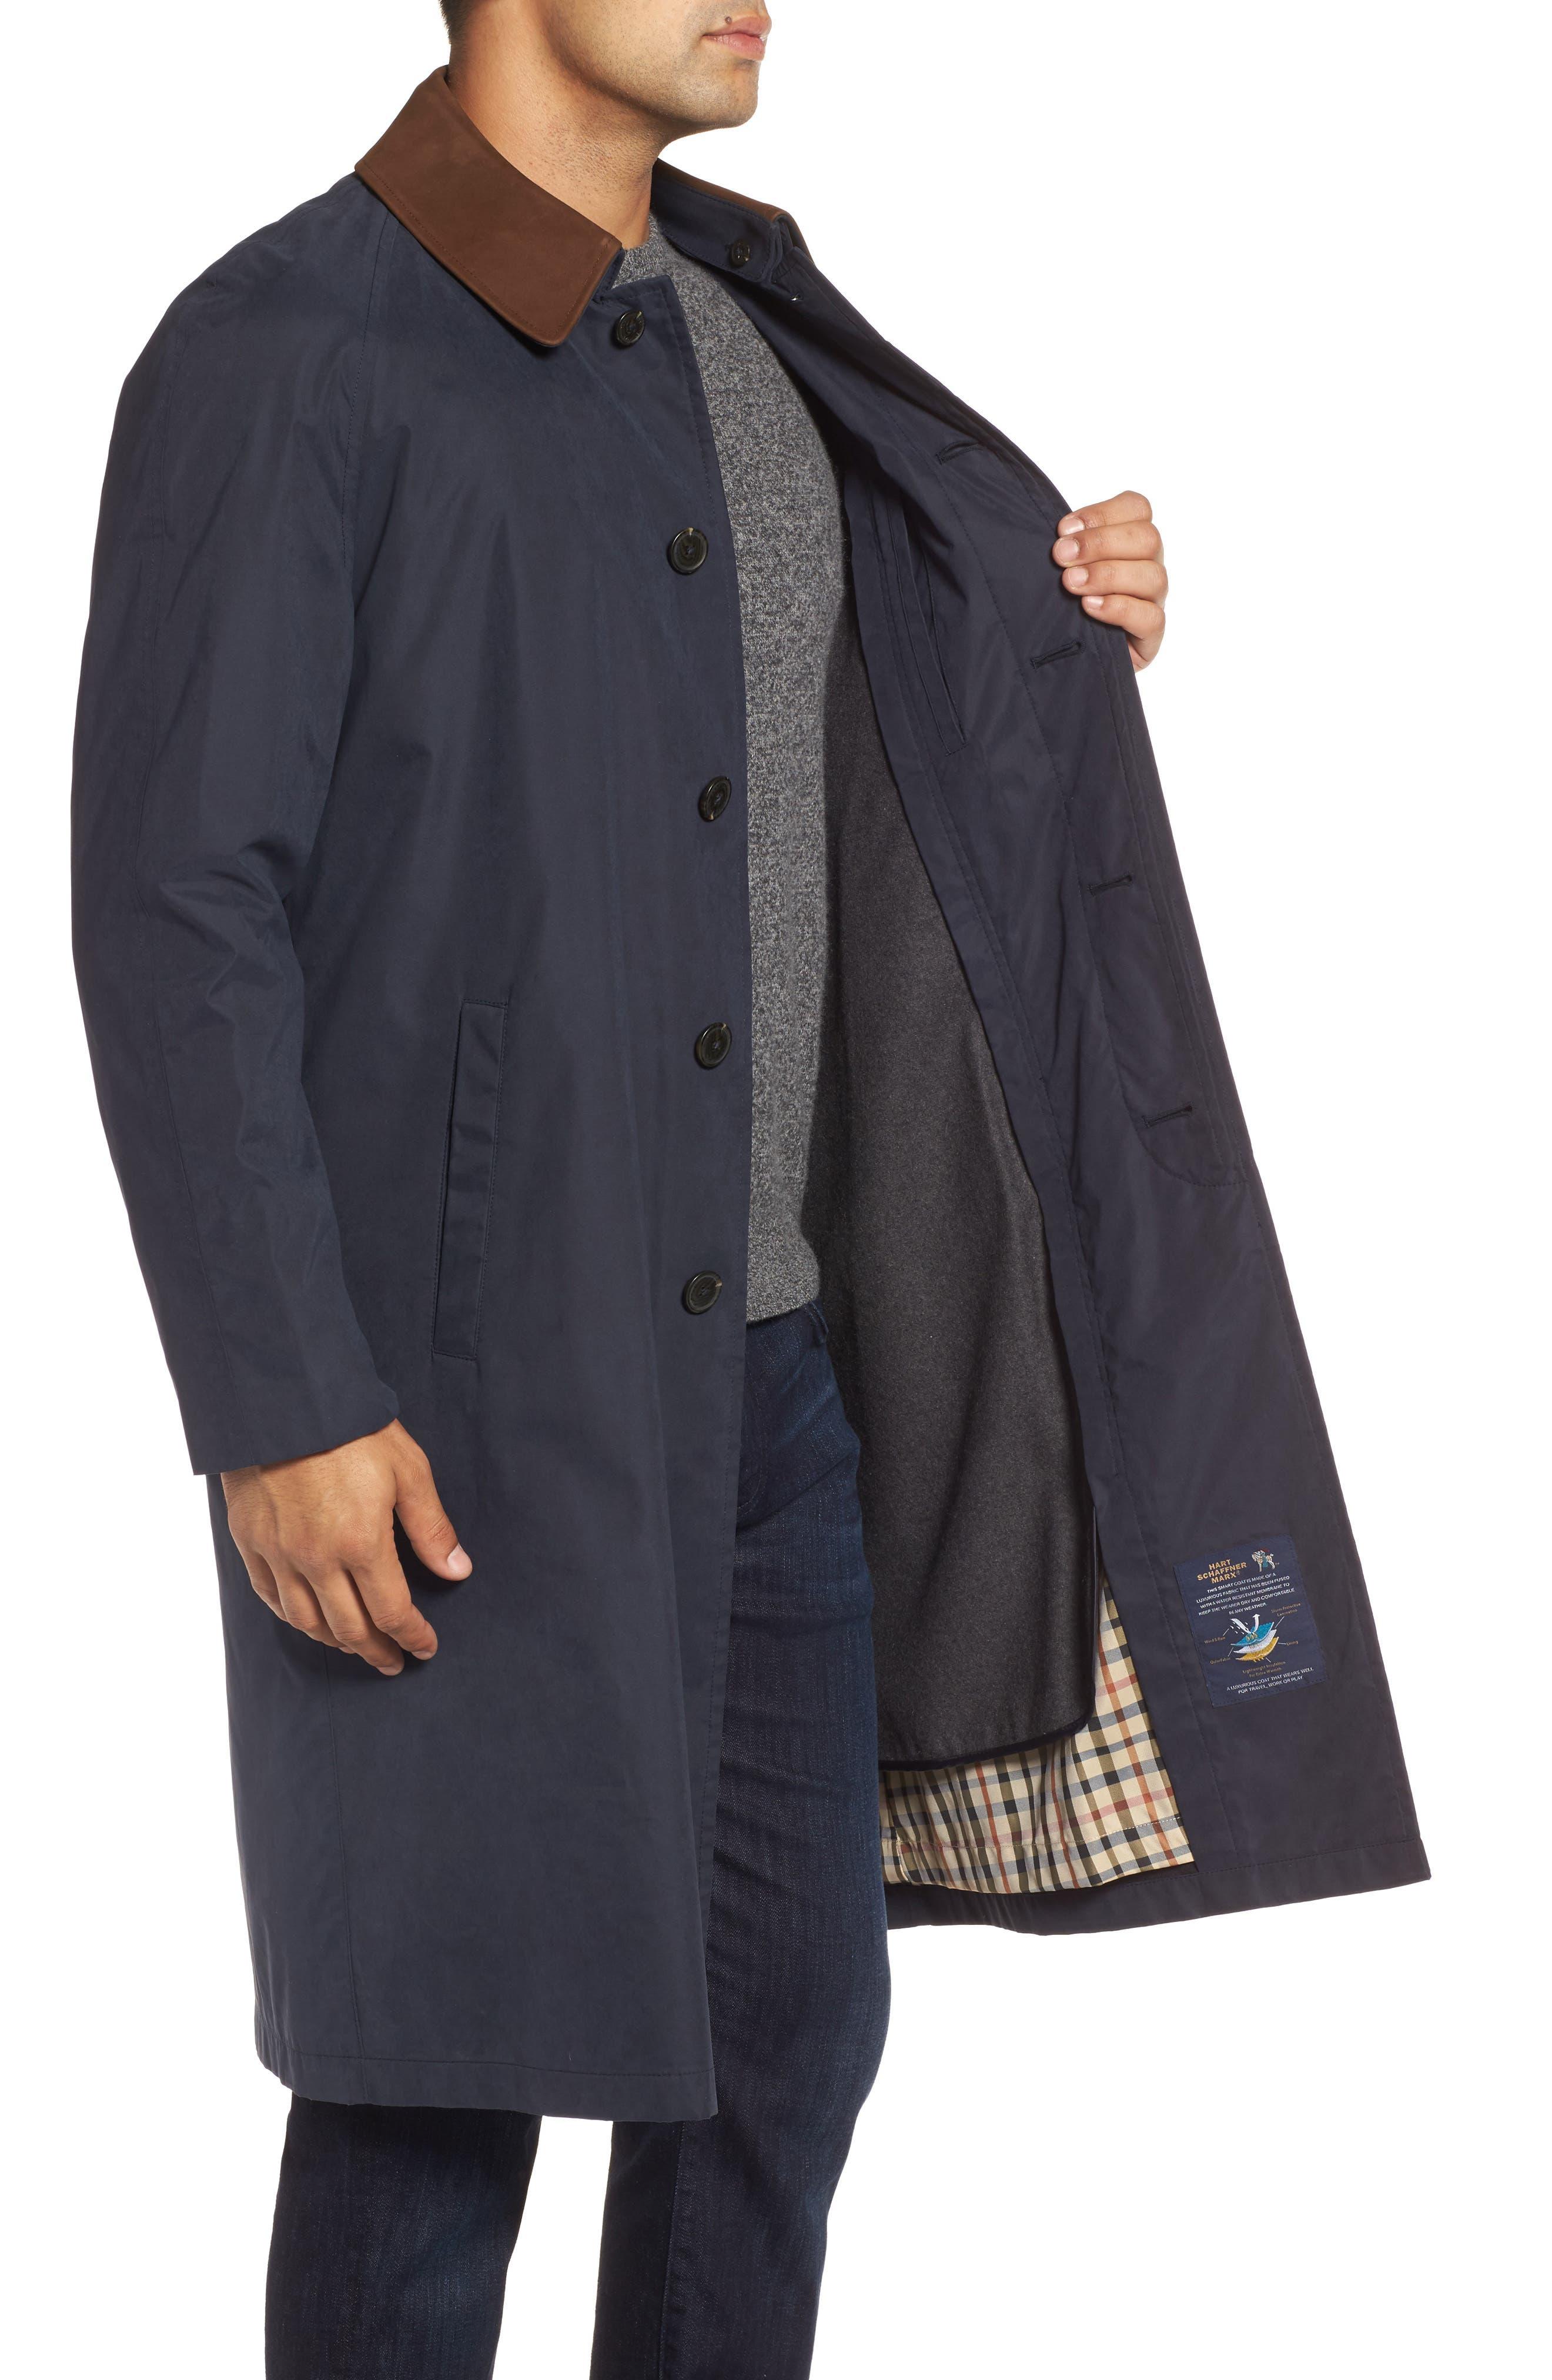 Lawrence Classic Fit Rain Coat,                             Alternate thumbnail 3, color,                             410